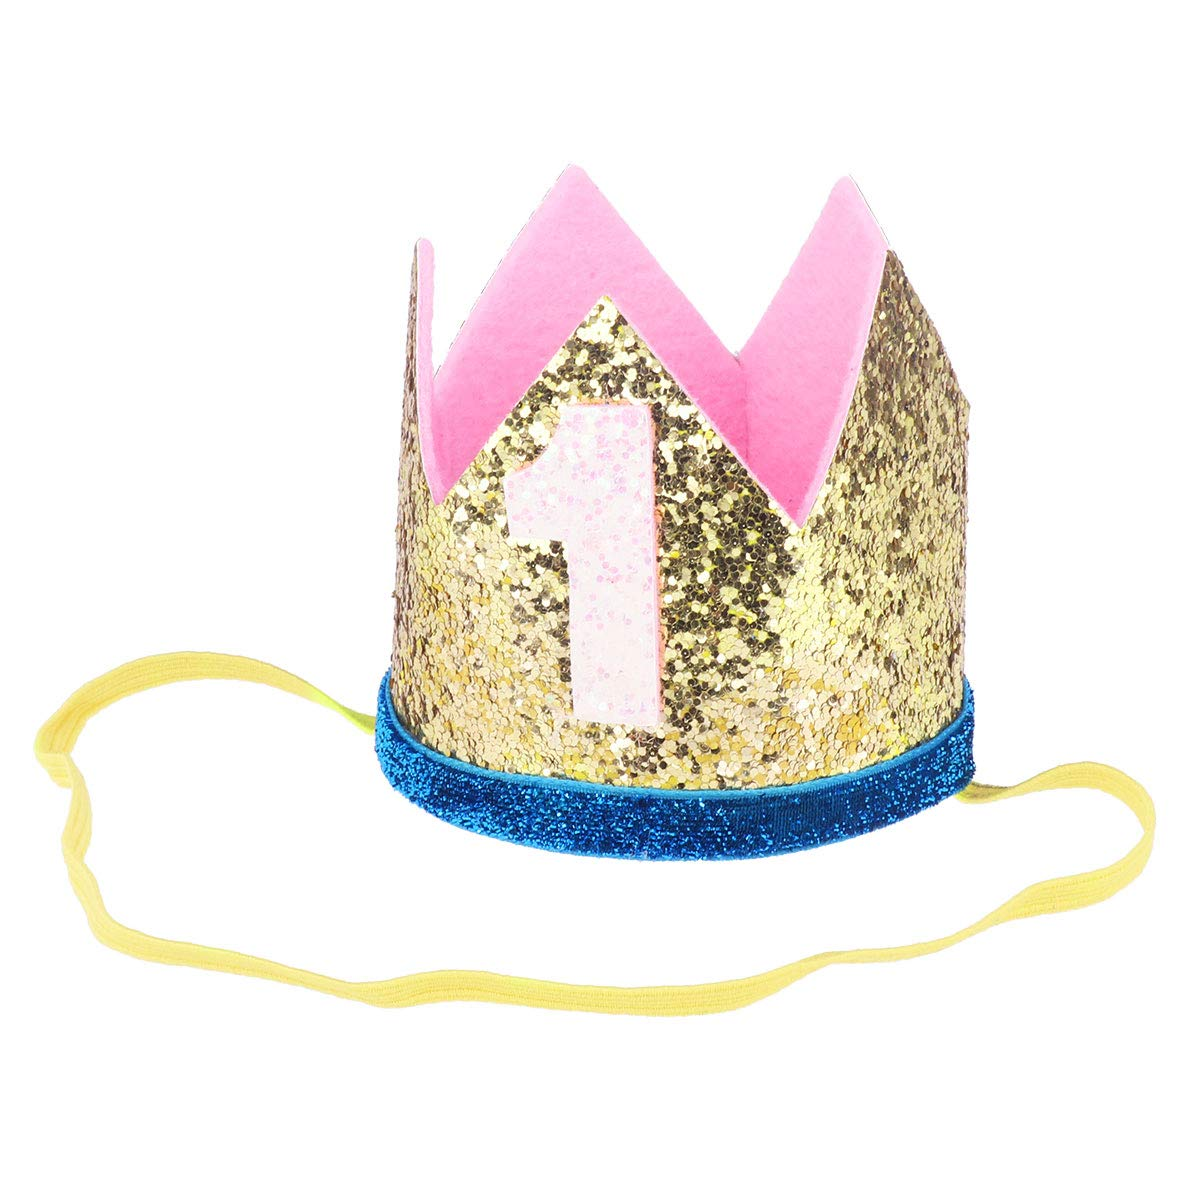 iiniim Baby Girls Boys First /1st Birthday Party Hat Little Prince Crown Headband Head wear Accessories Gold Number 1 One Size by iiniim (Image #3)